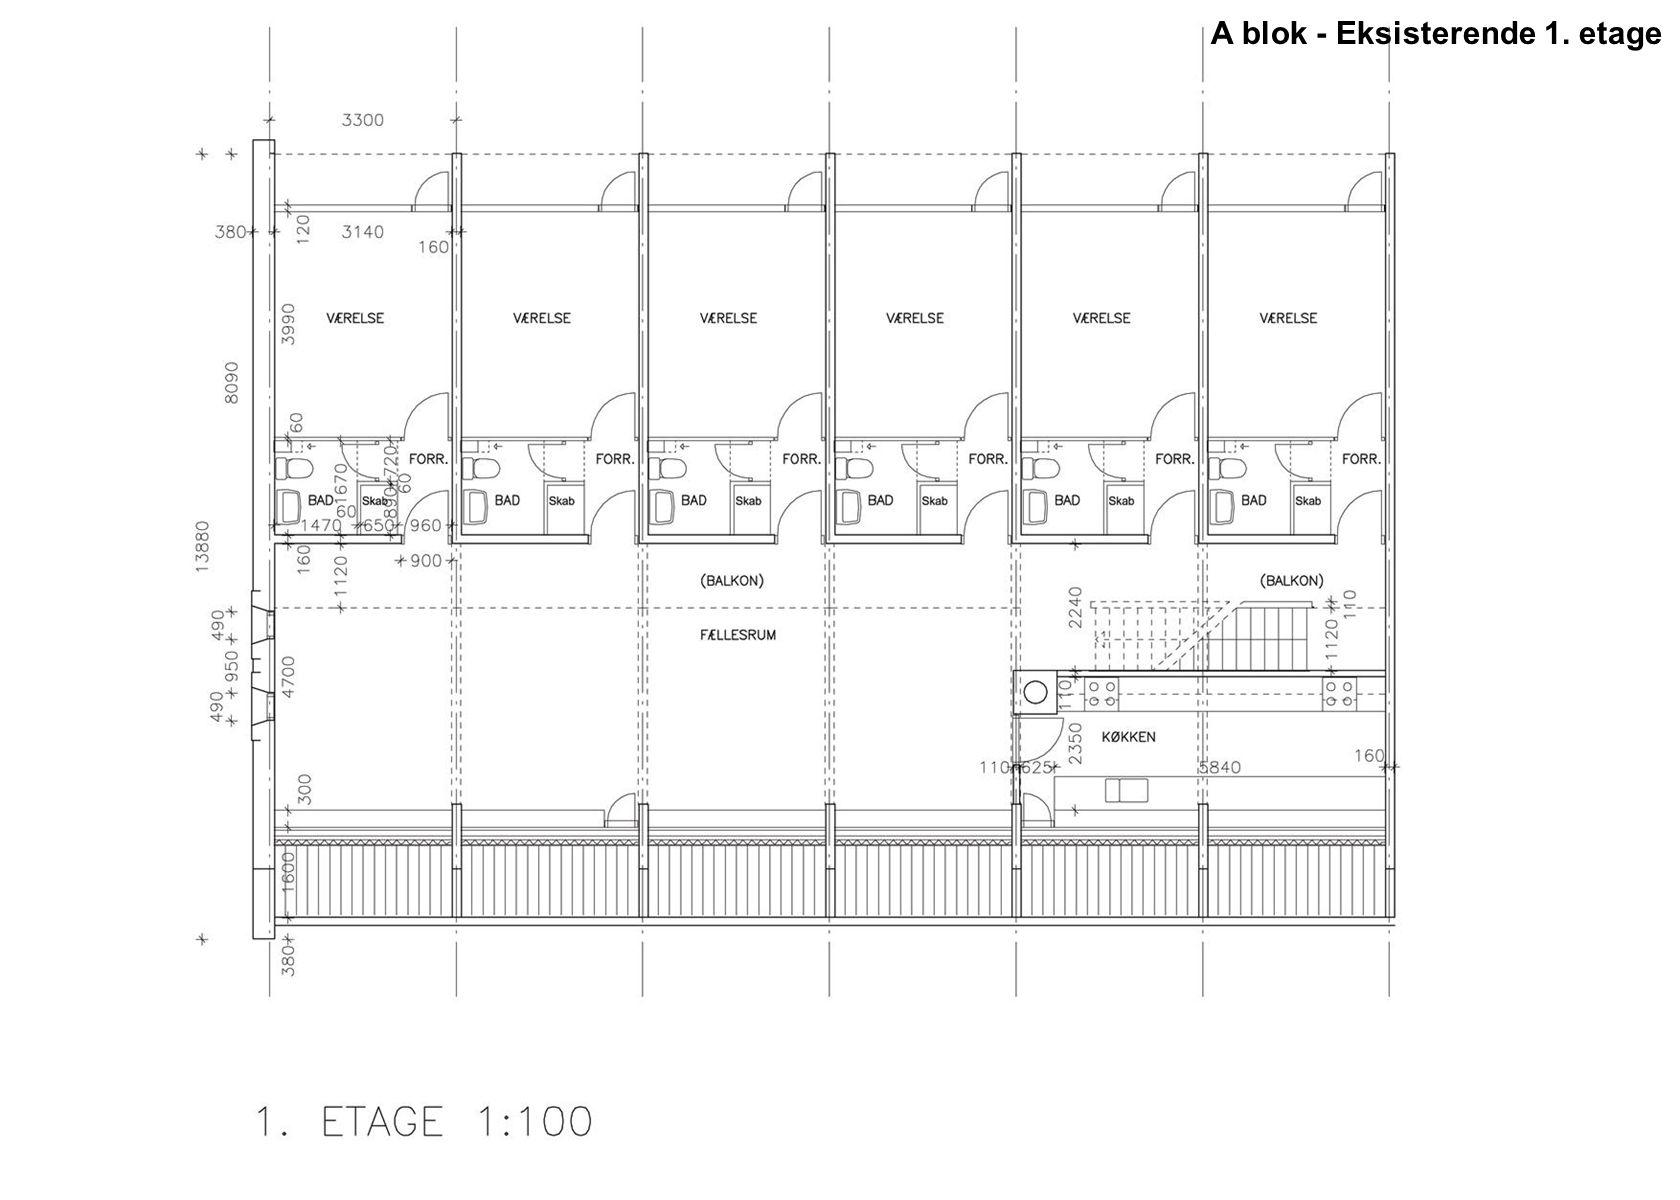 A blok - Eksisterende 1. etage